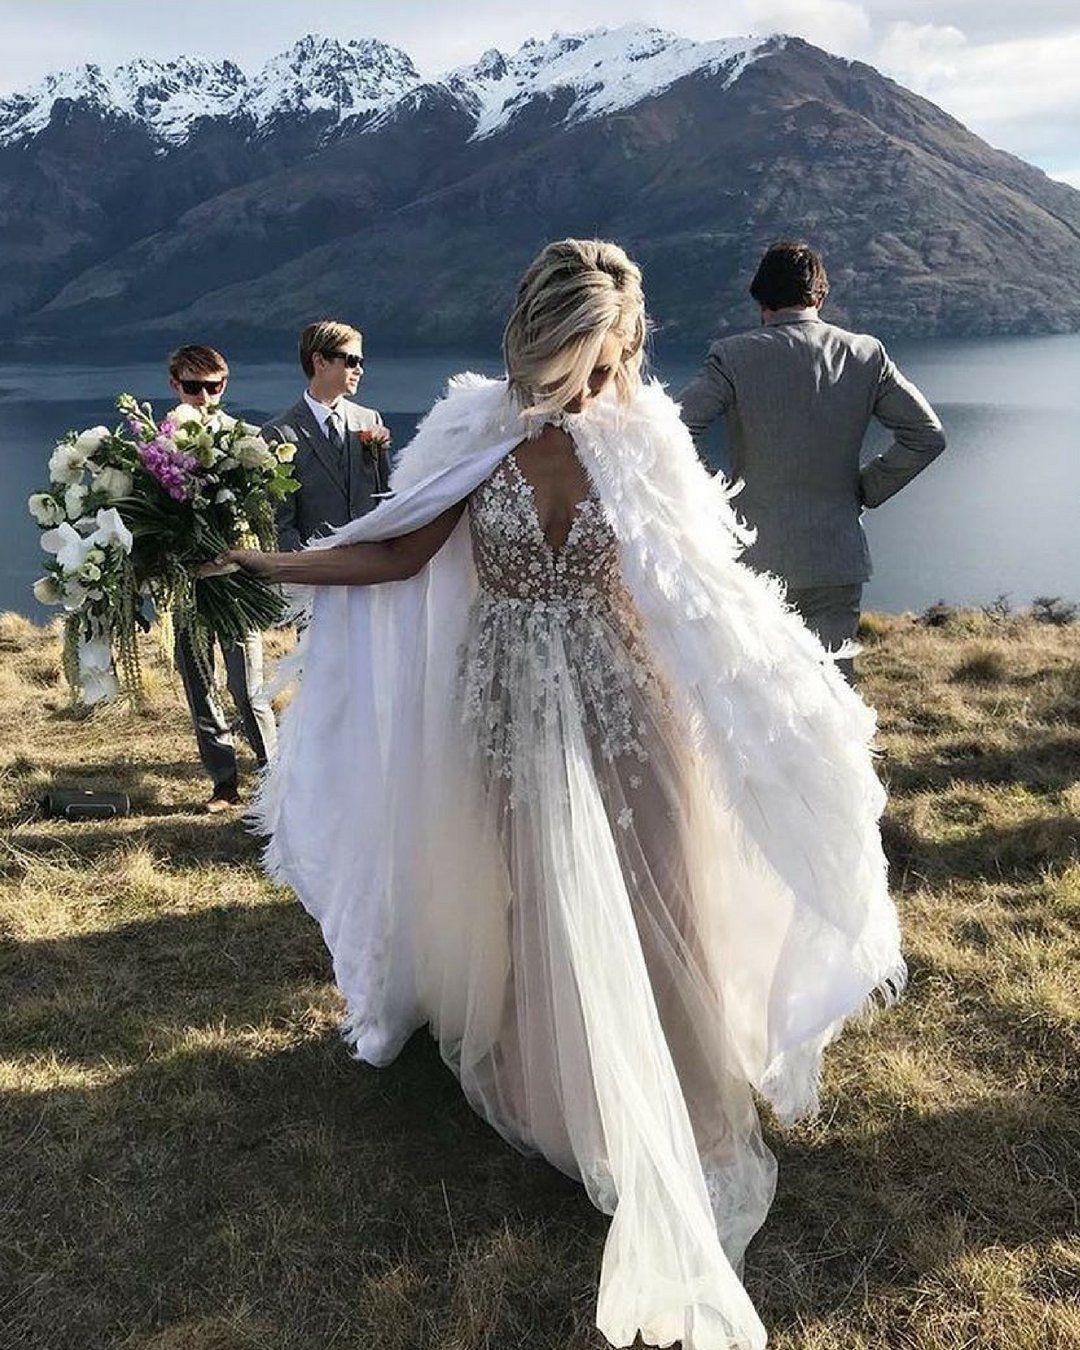 ? WeddingForward // The perfect dress will make you a real ...